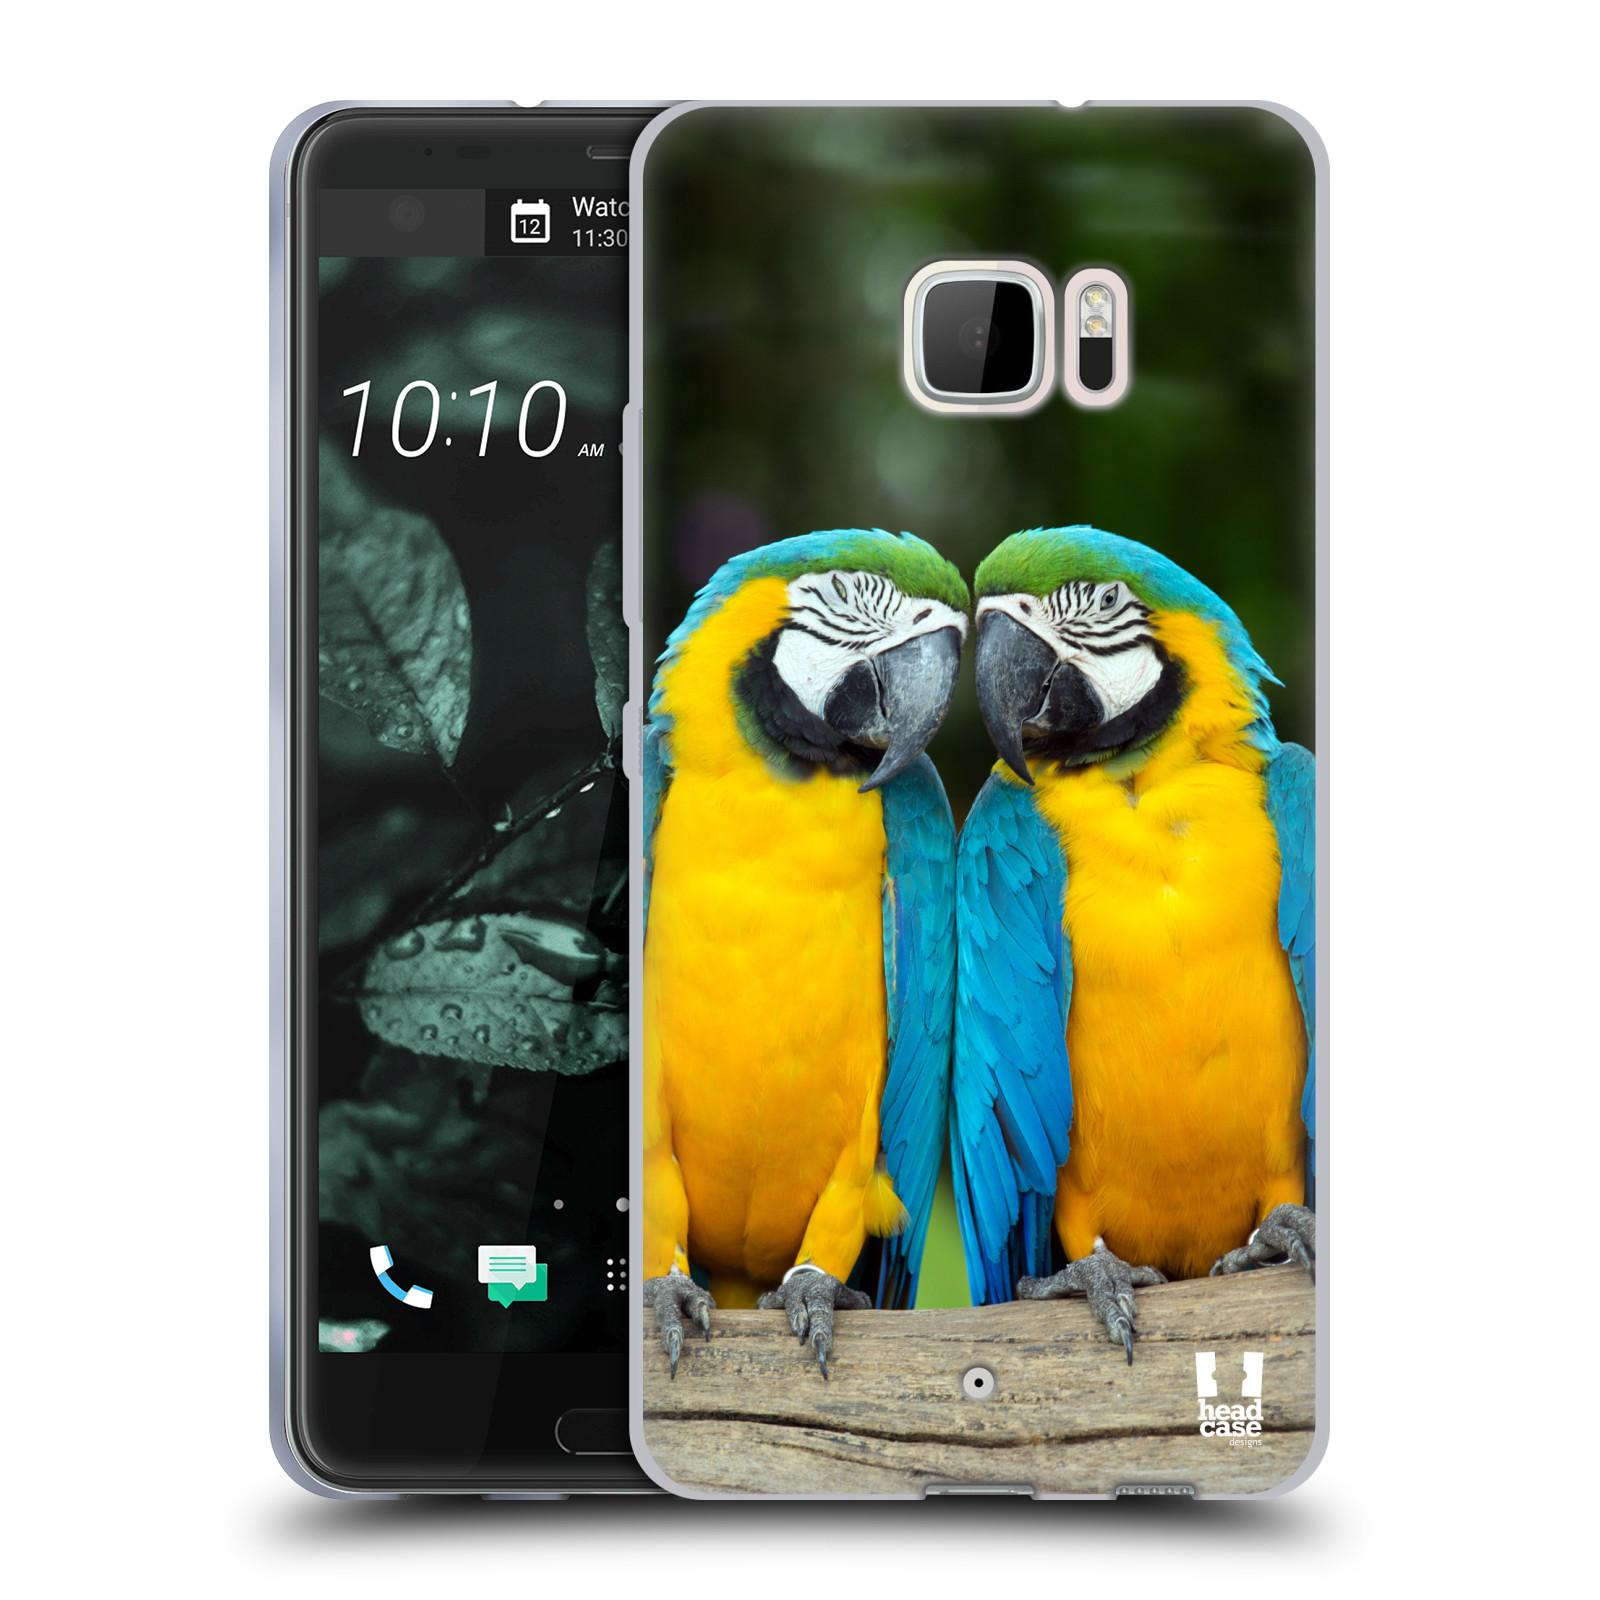 HEAD-CASE-DESIGNS-FAMOUS-ANIMALS-SOFT-GEL-CASE-FOR-HTC-U-ULTRA